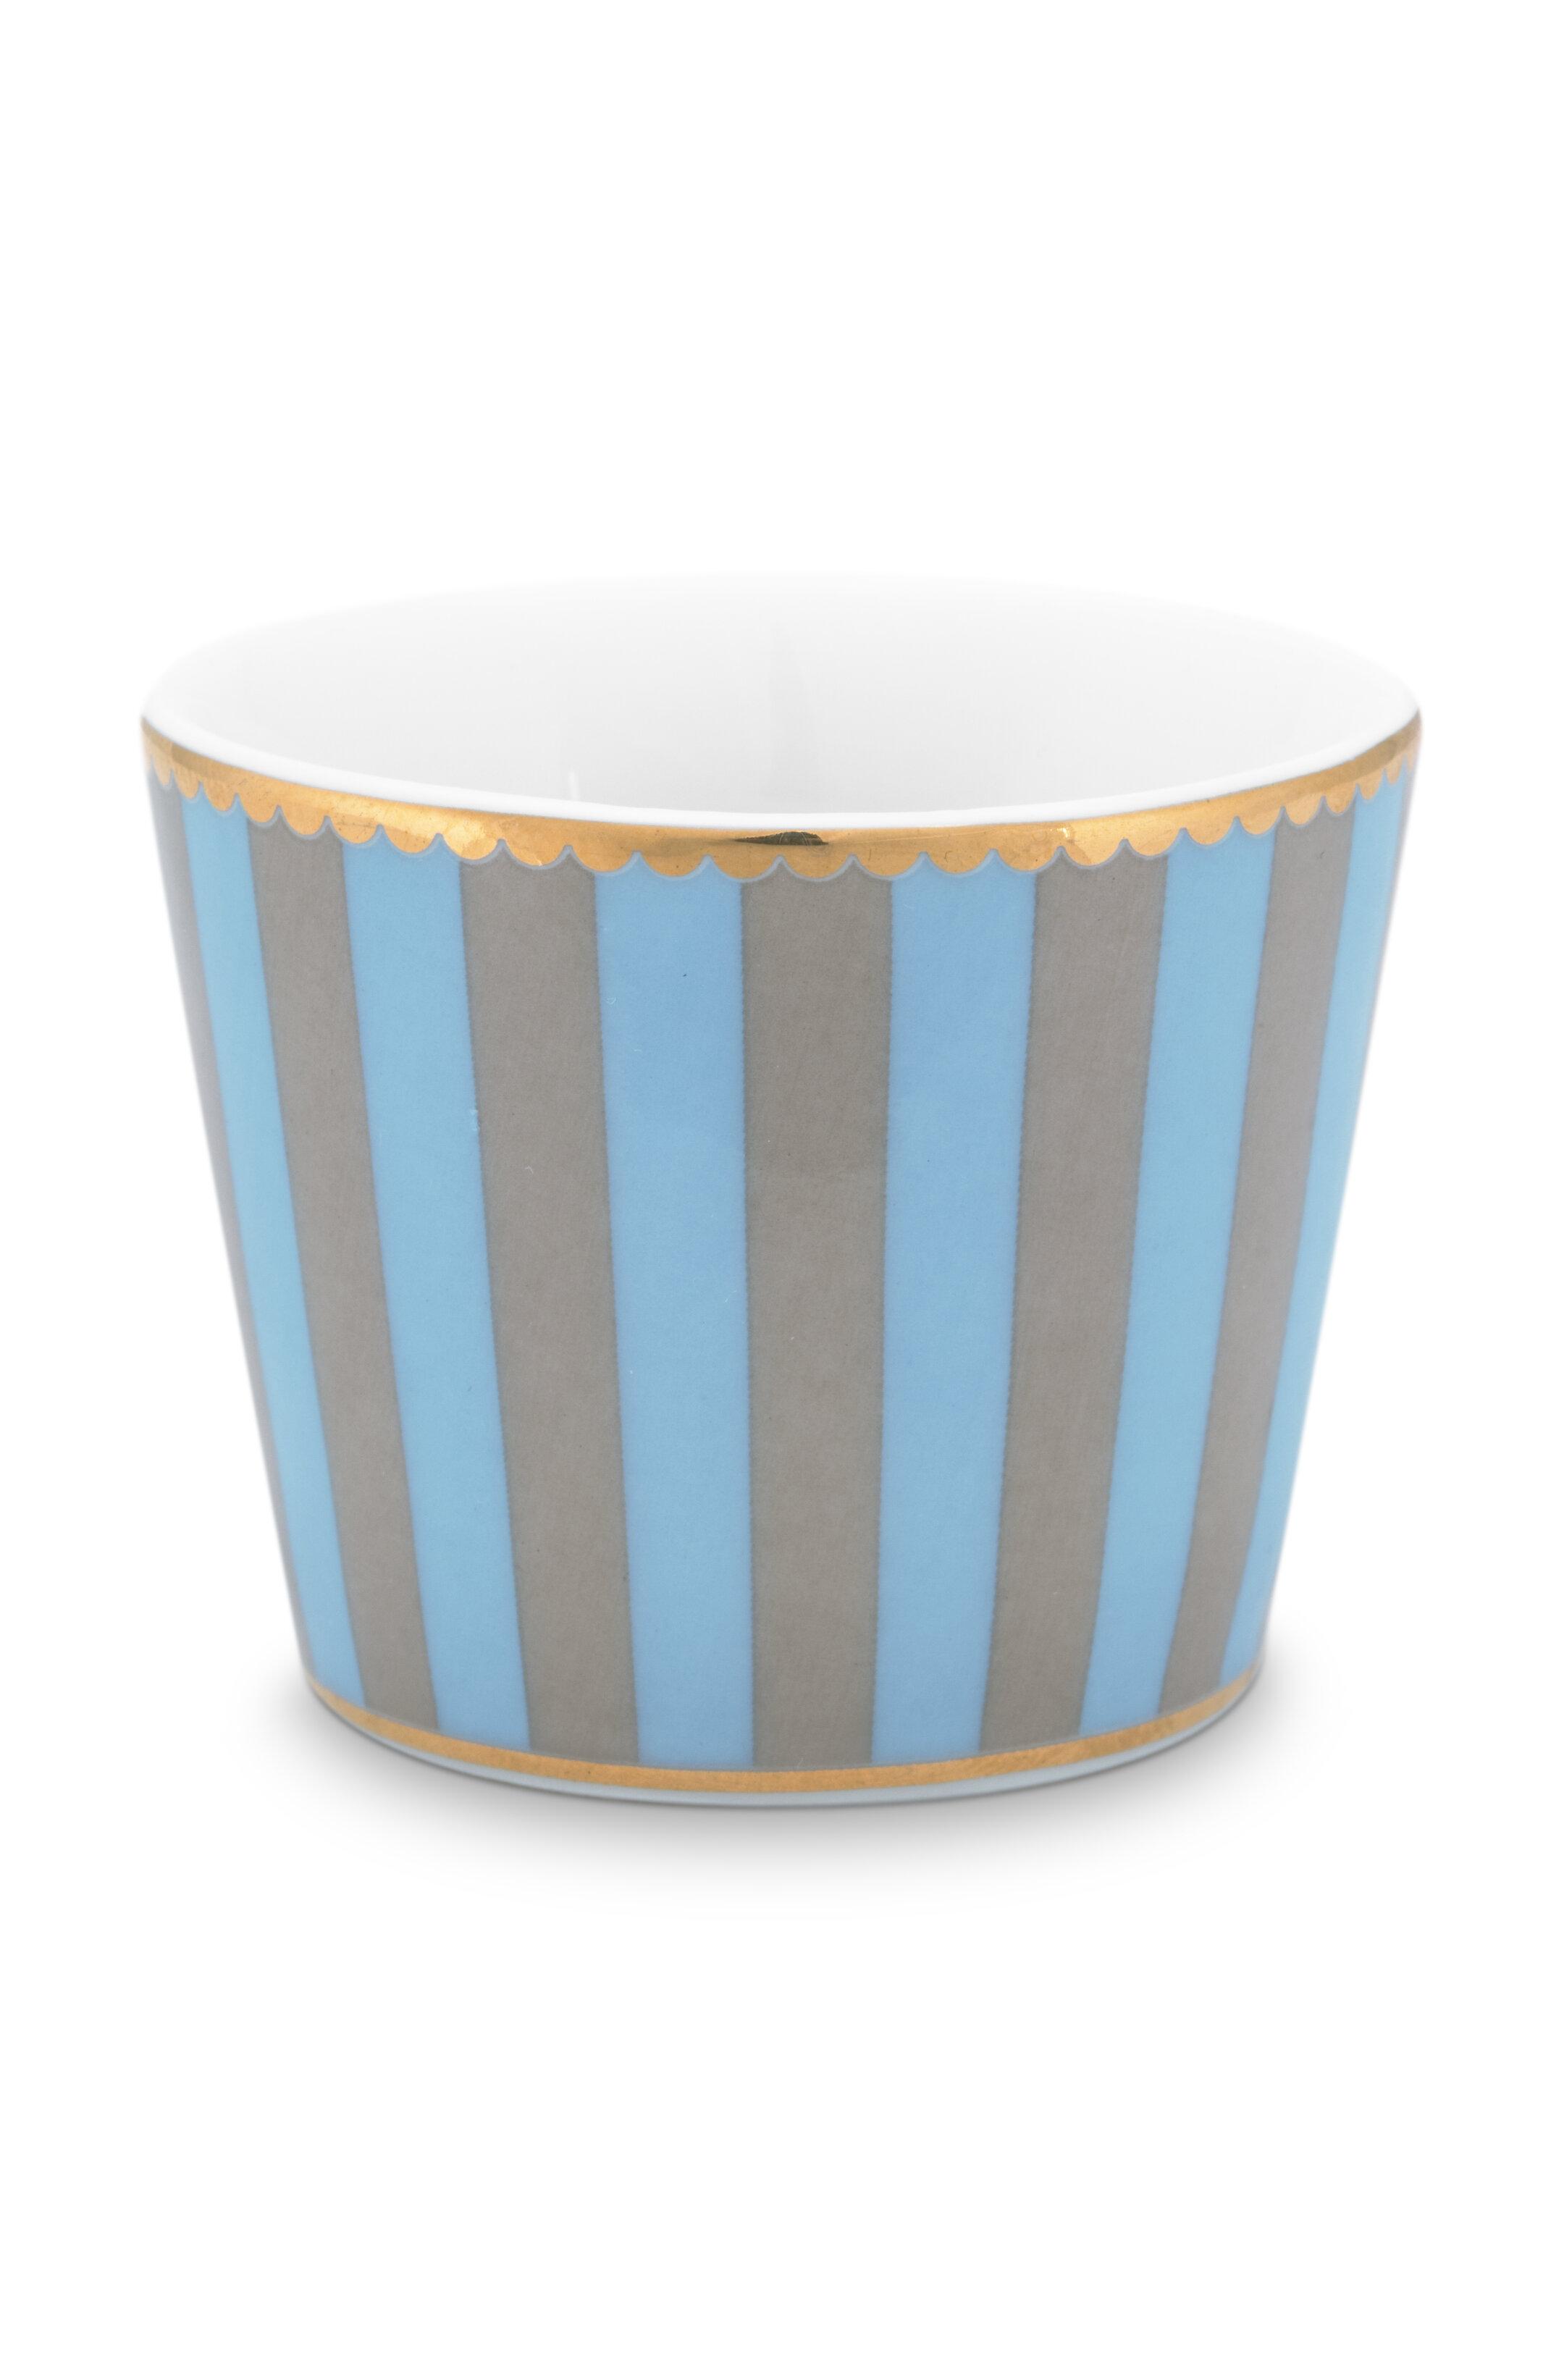 Pip Studio Love Birds Eierbecher Stripes Blue-Khaki